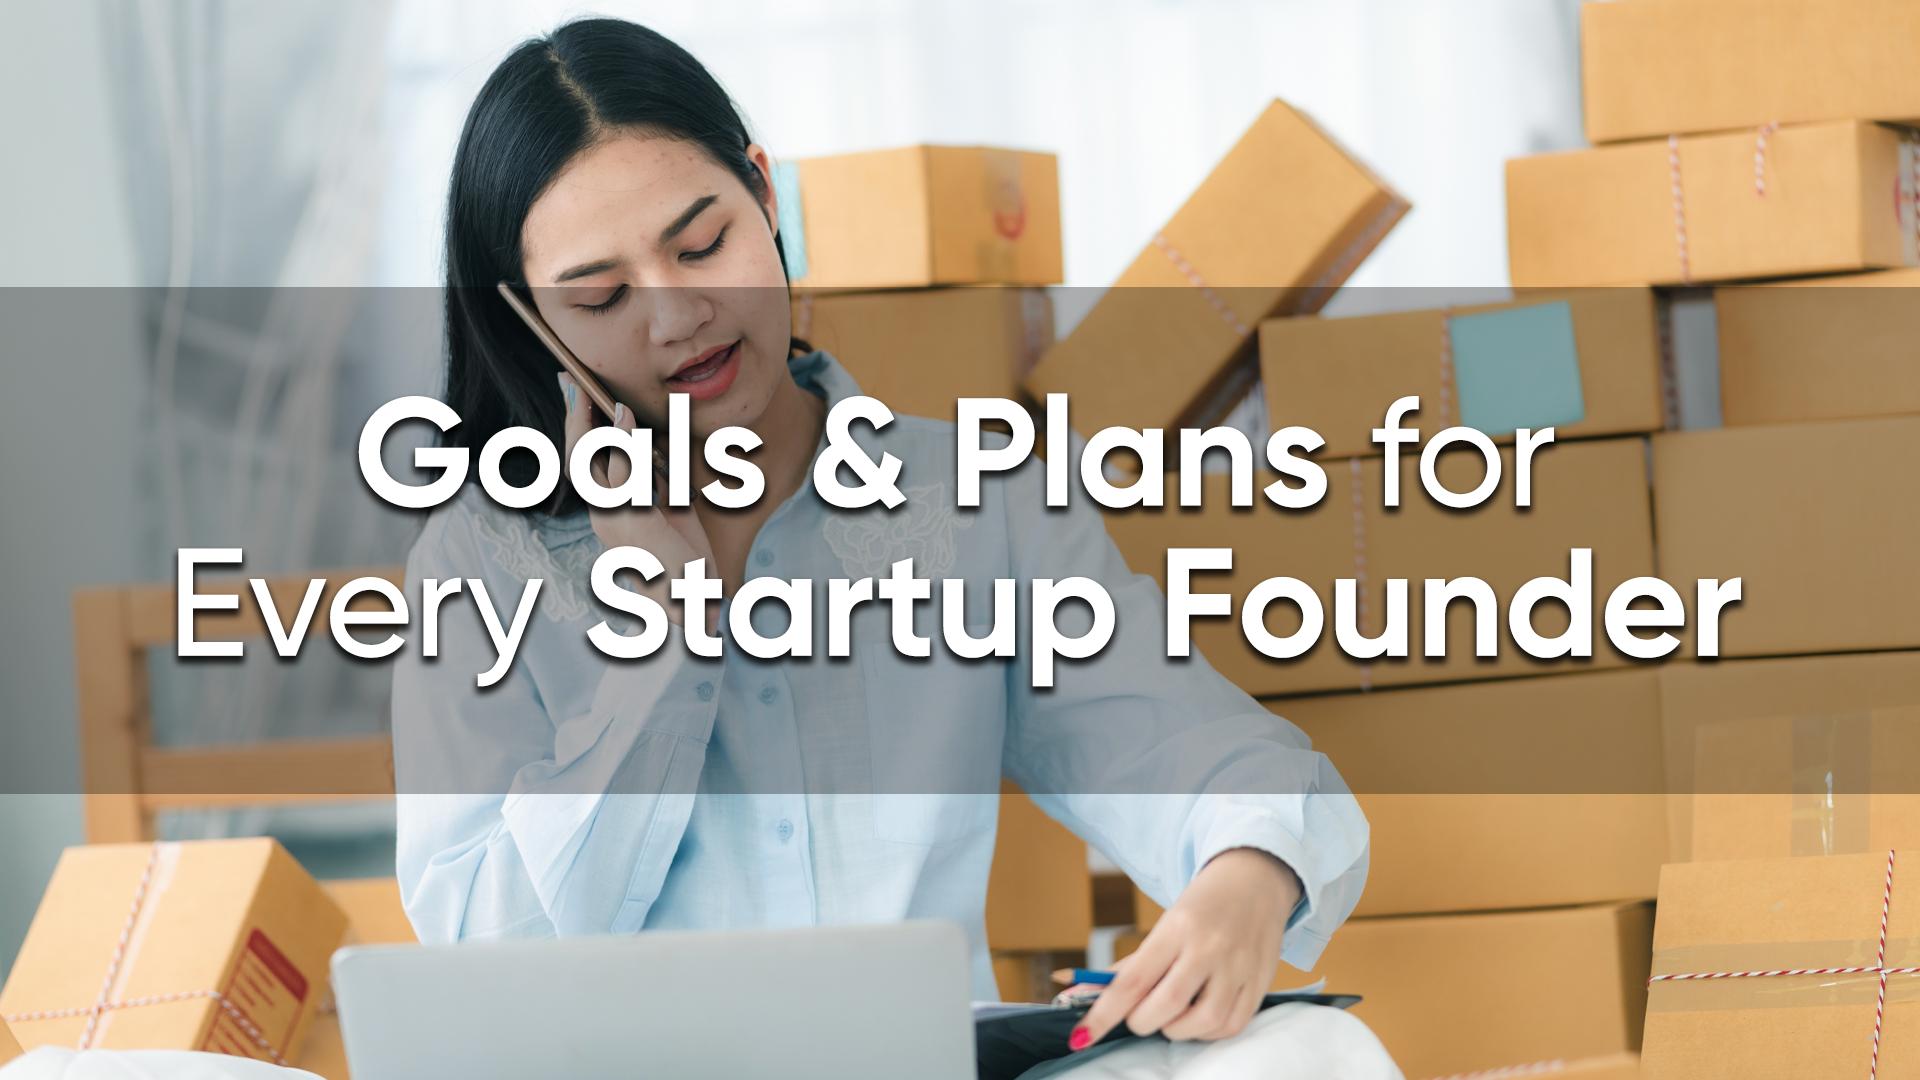 startup founder, startup goals, startup business, startup, online store, ecommerce, startup plans, startup 2021, startup founder, founder tips, founder goals, startup tips, 2021 small business tips, small business plans, small business goals